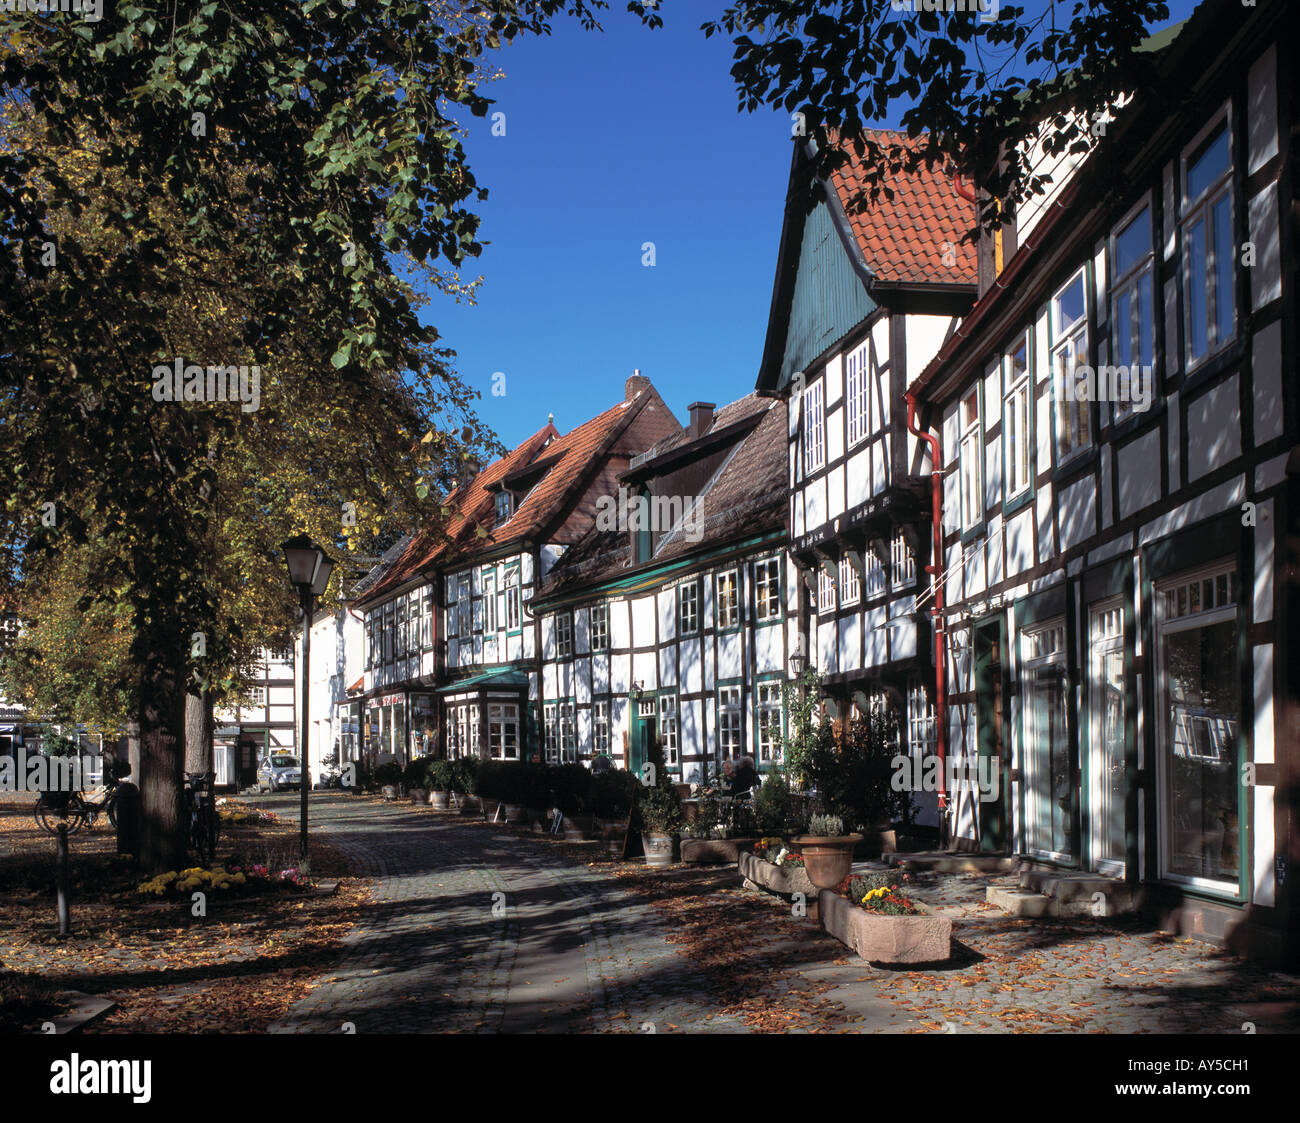 Fachwerkhaeuser Am Kirchplatz In Bad Essen Hunte